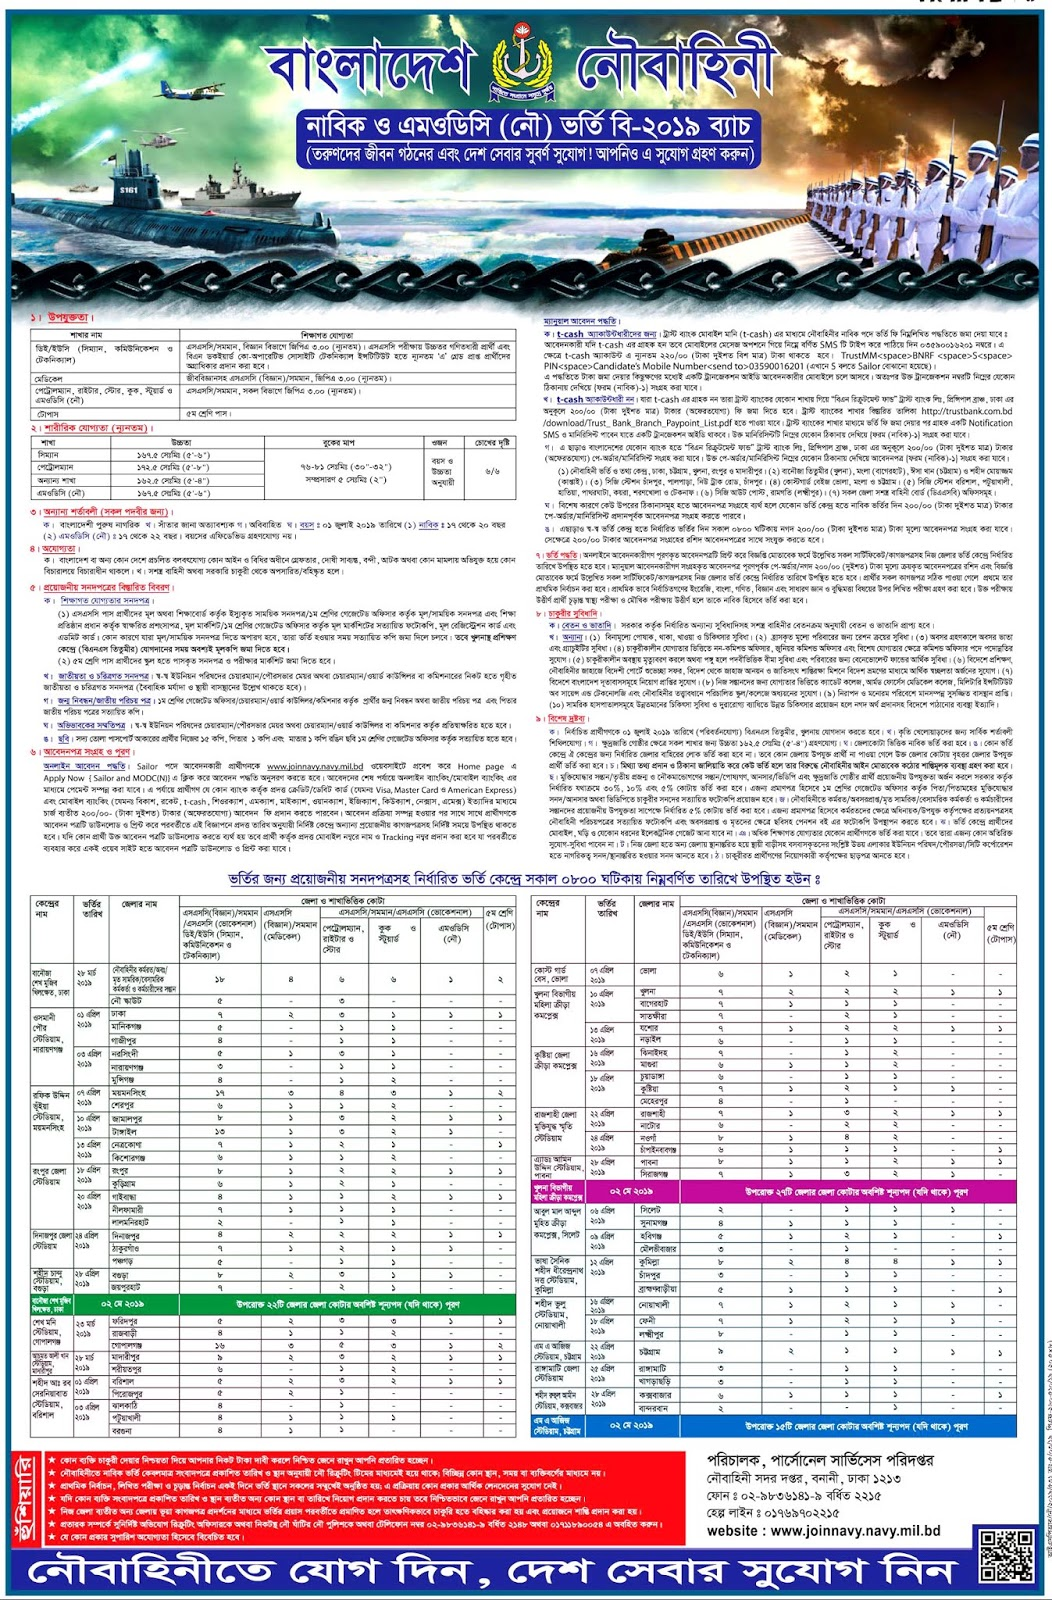 Bangladesh Navy Jobs Circular 2019 – www.joinnavy.mil.bd